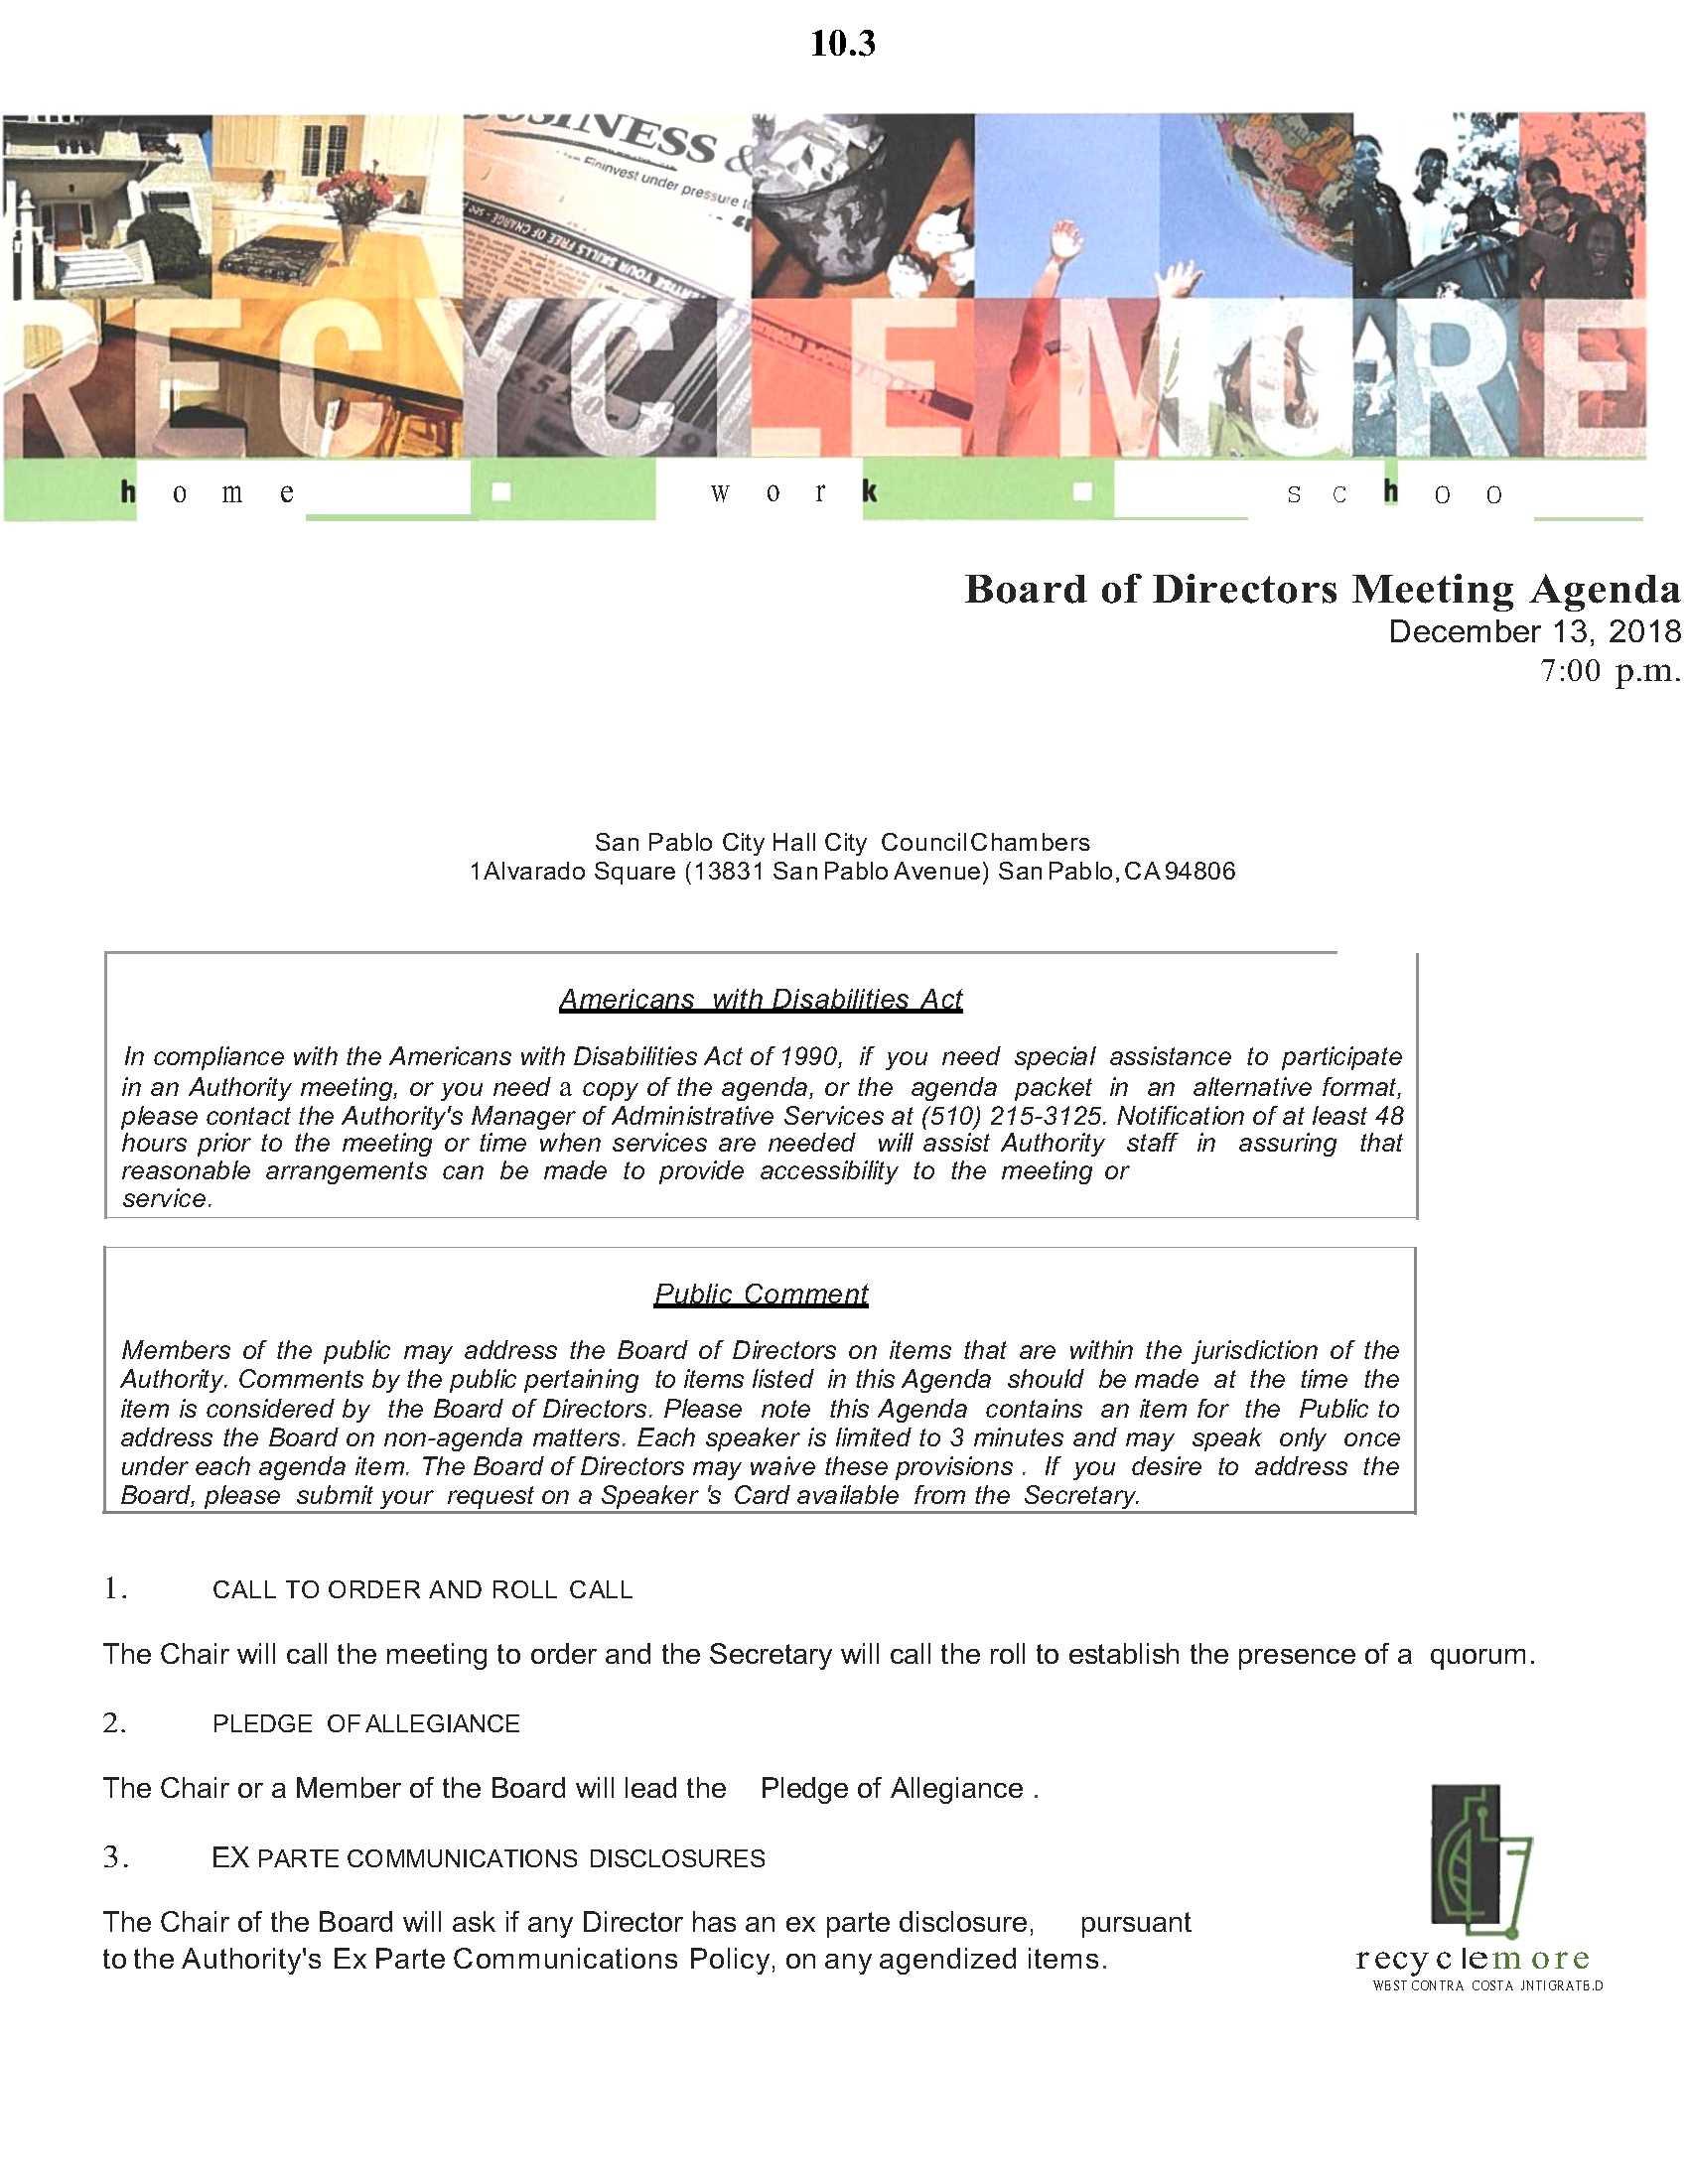 ESMAC Agenda 1.9.2019 (34 Pages)_16.jpg